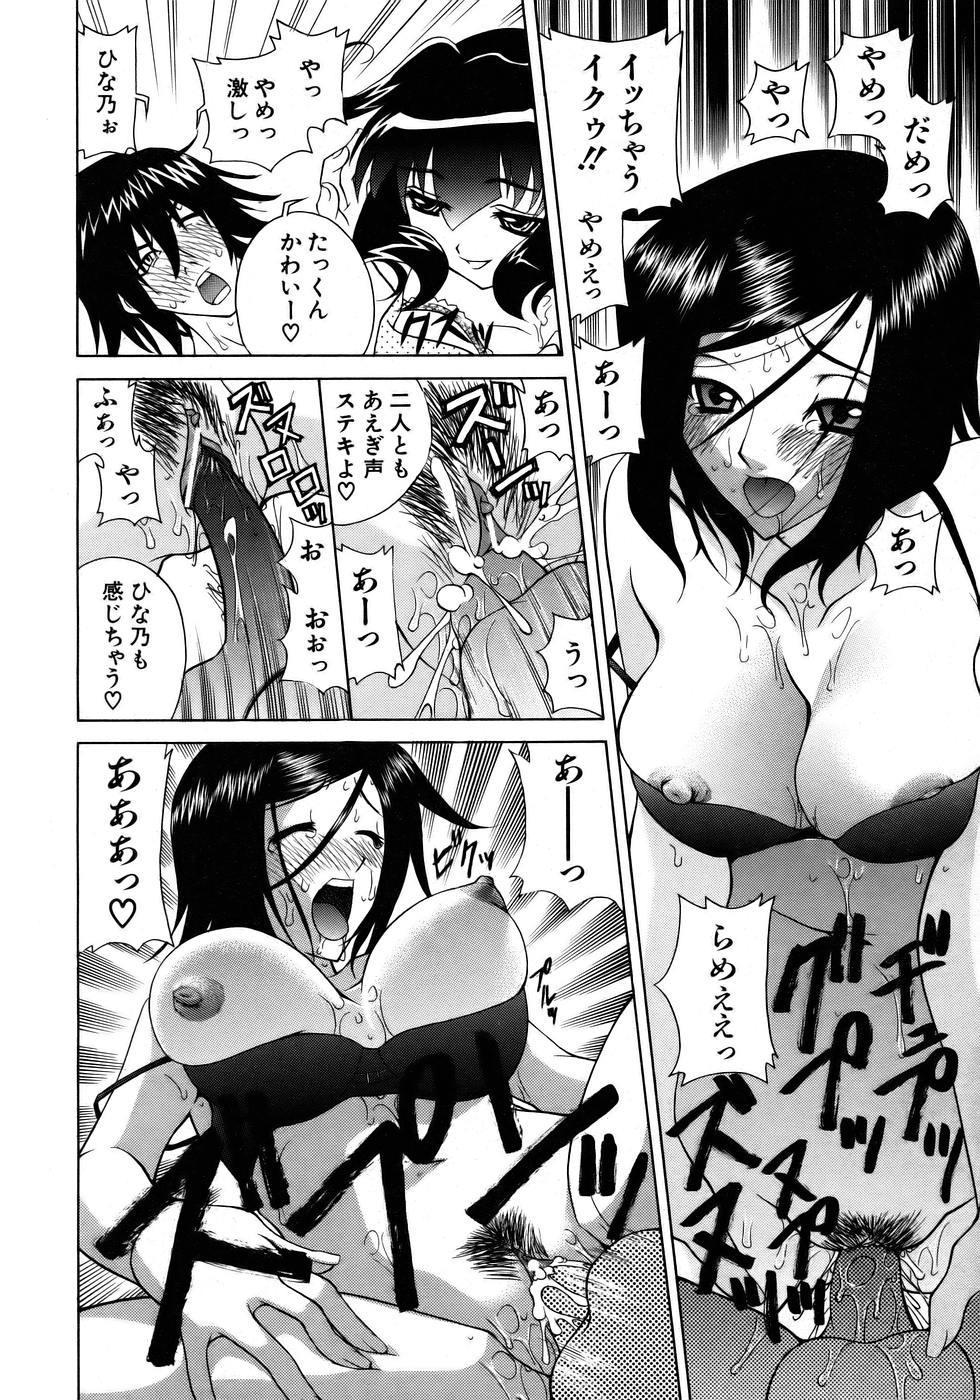 COMIC AUN 2005-12 Vol. 115 327